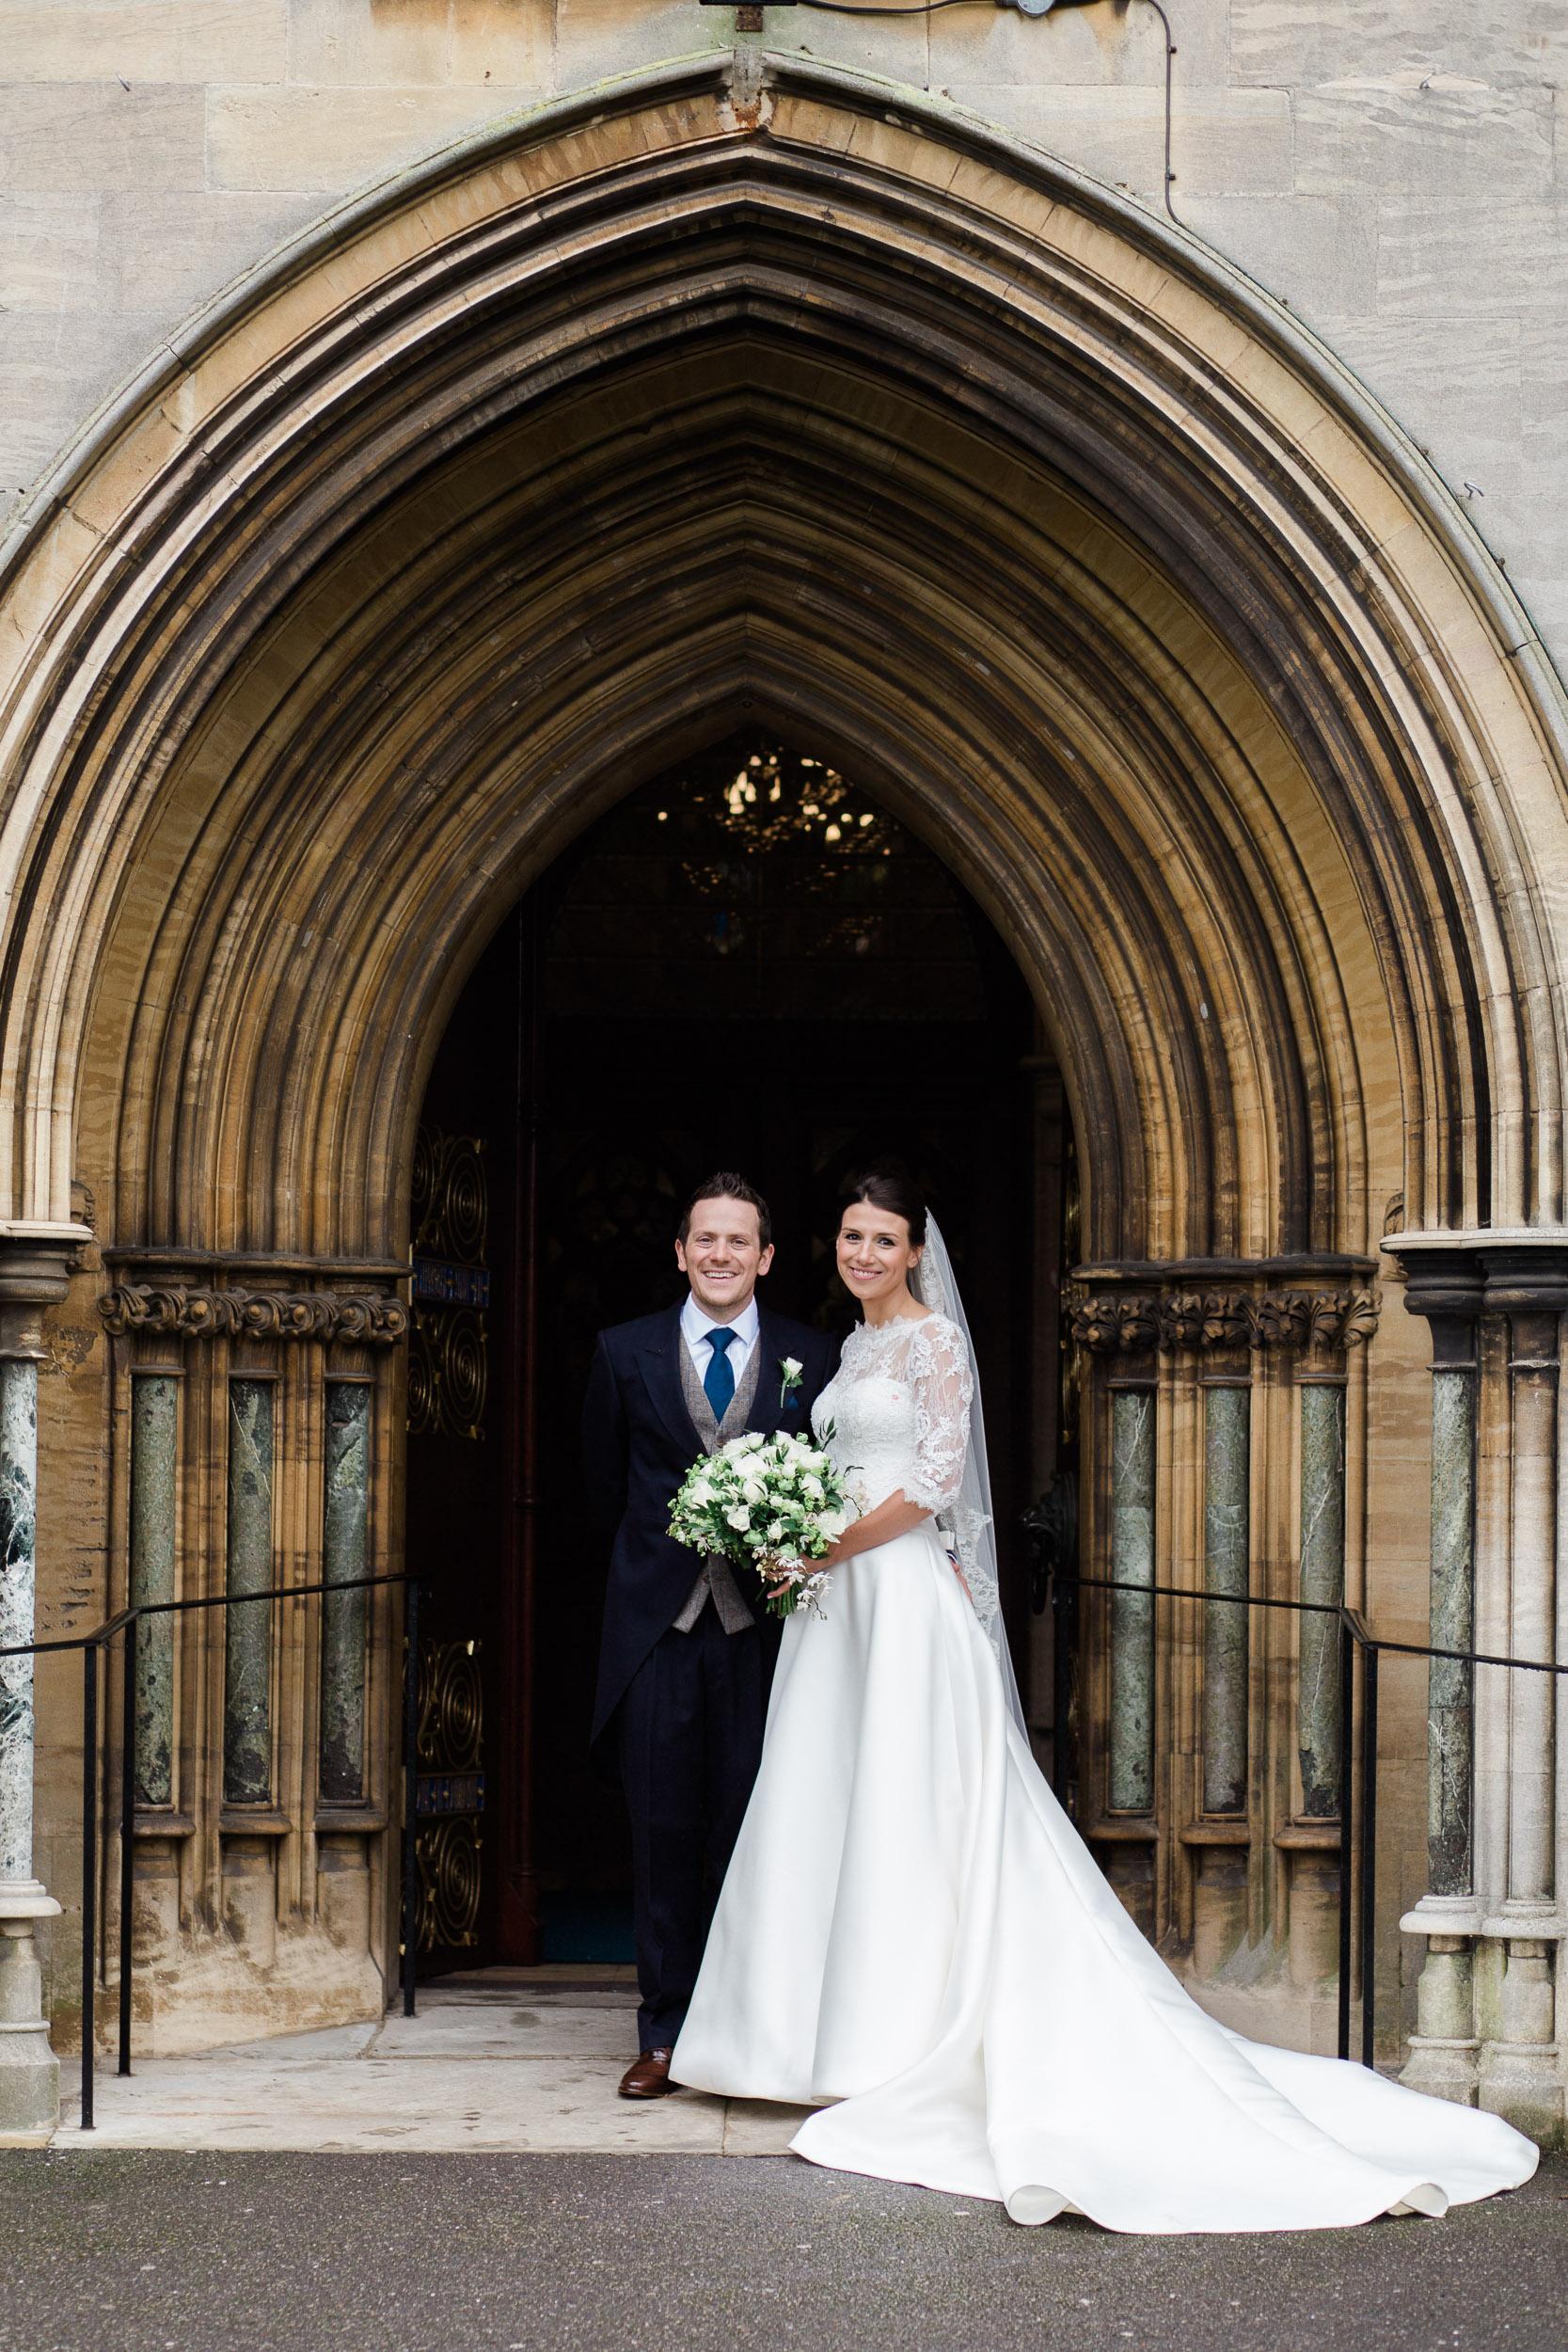 Bride and Groom pose in doorway of church